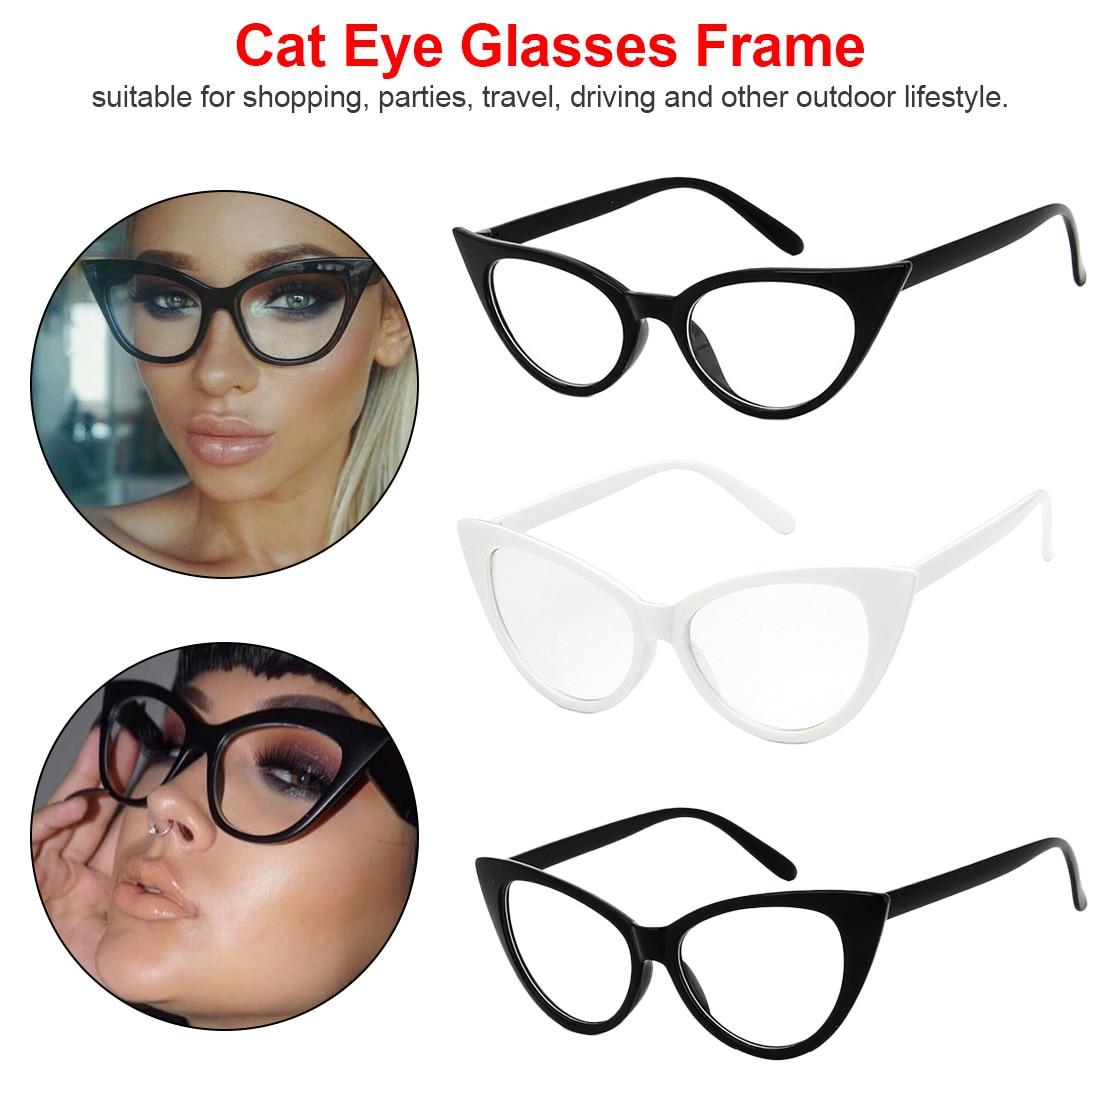 1 Pcs Klassische Elegante Gläser Rahmen Cat Eye Männer Frauen Brillen Vintage Design-student Gläser Klare Linse Plain Brillen